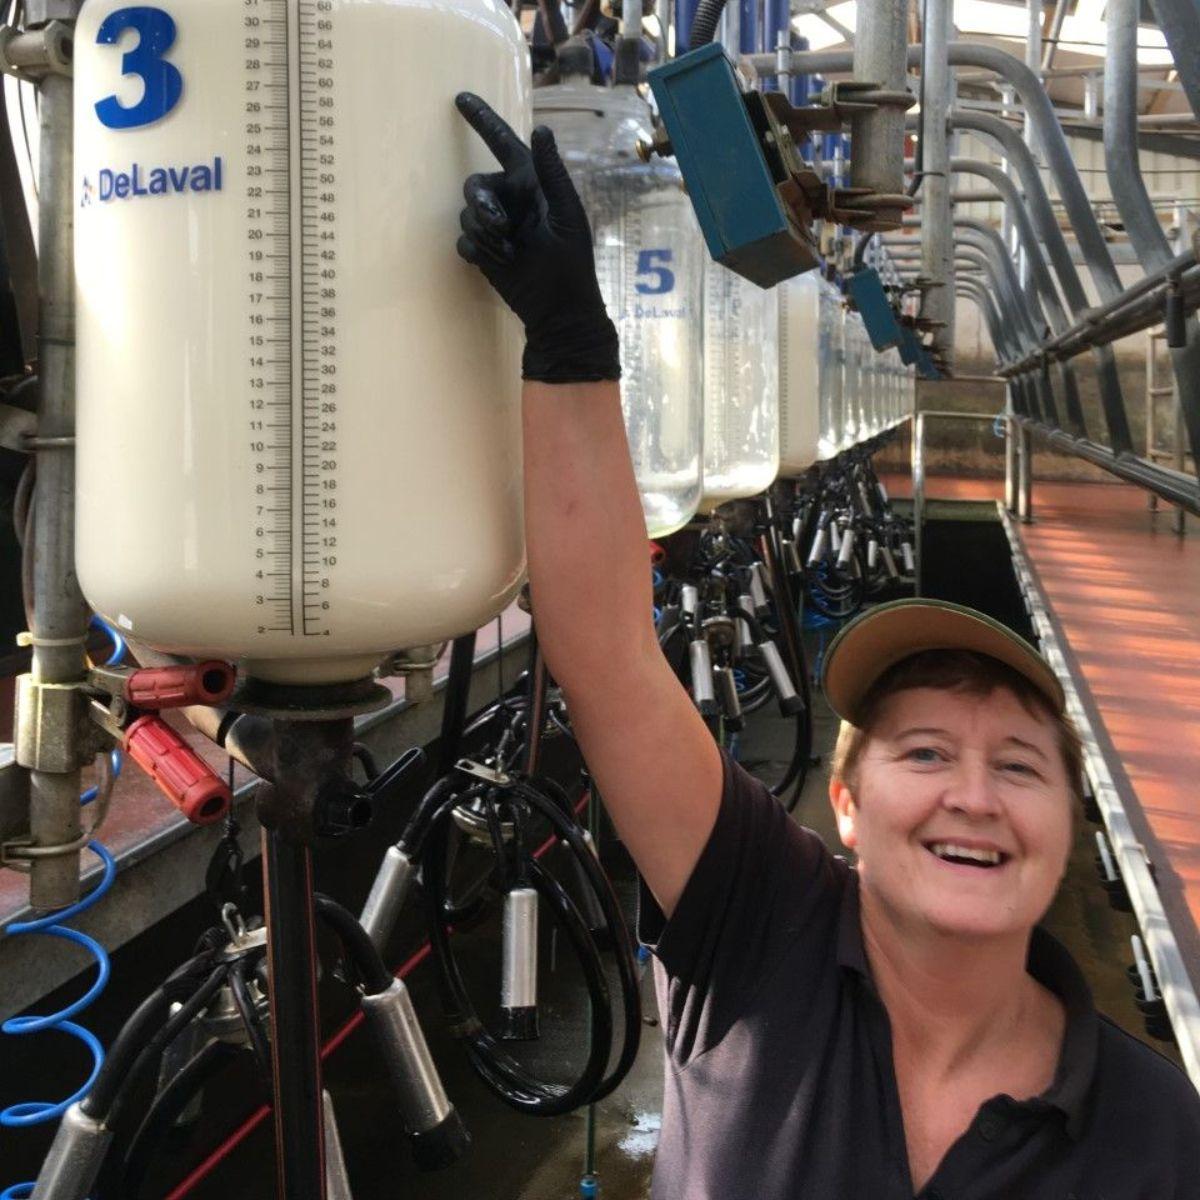 Montbeliarde, Ann Fitzgerald, dairy farmer, milking parlour, DeLaval milking parlour